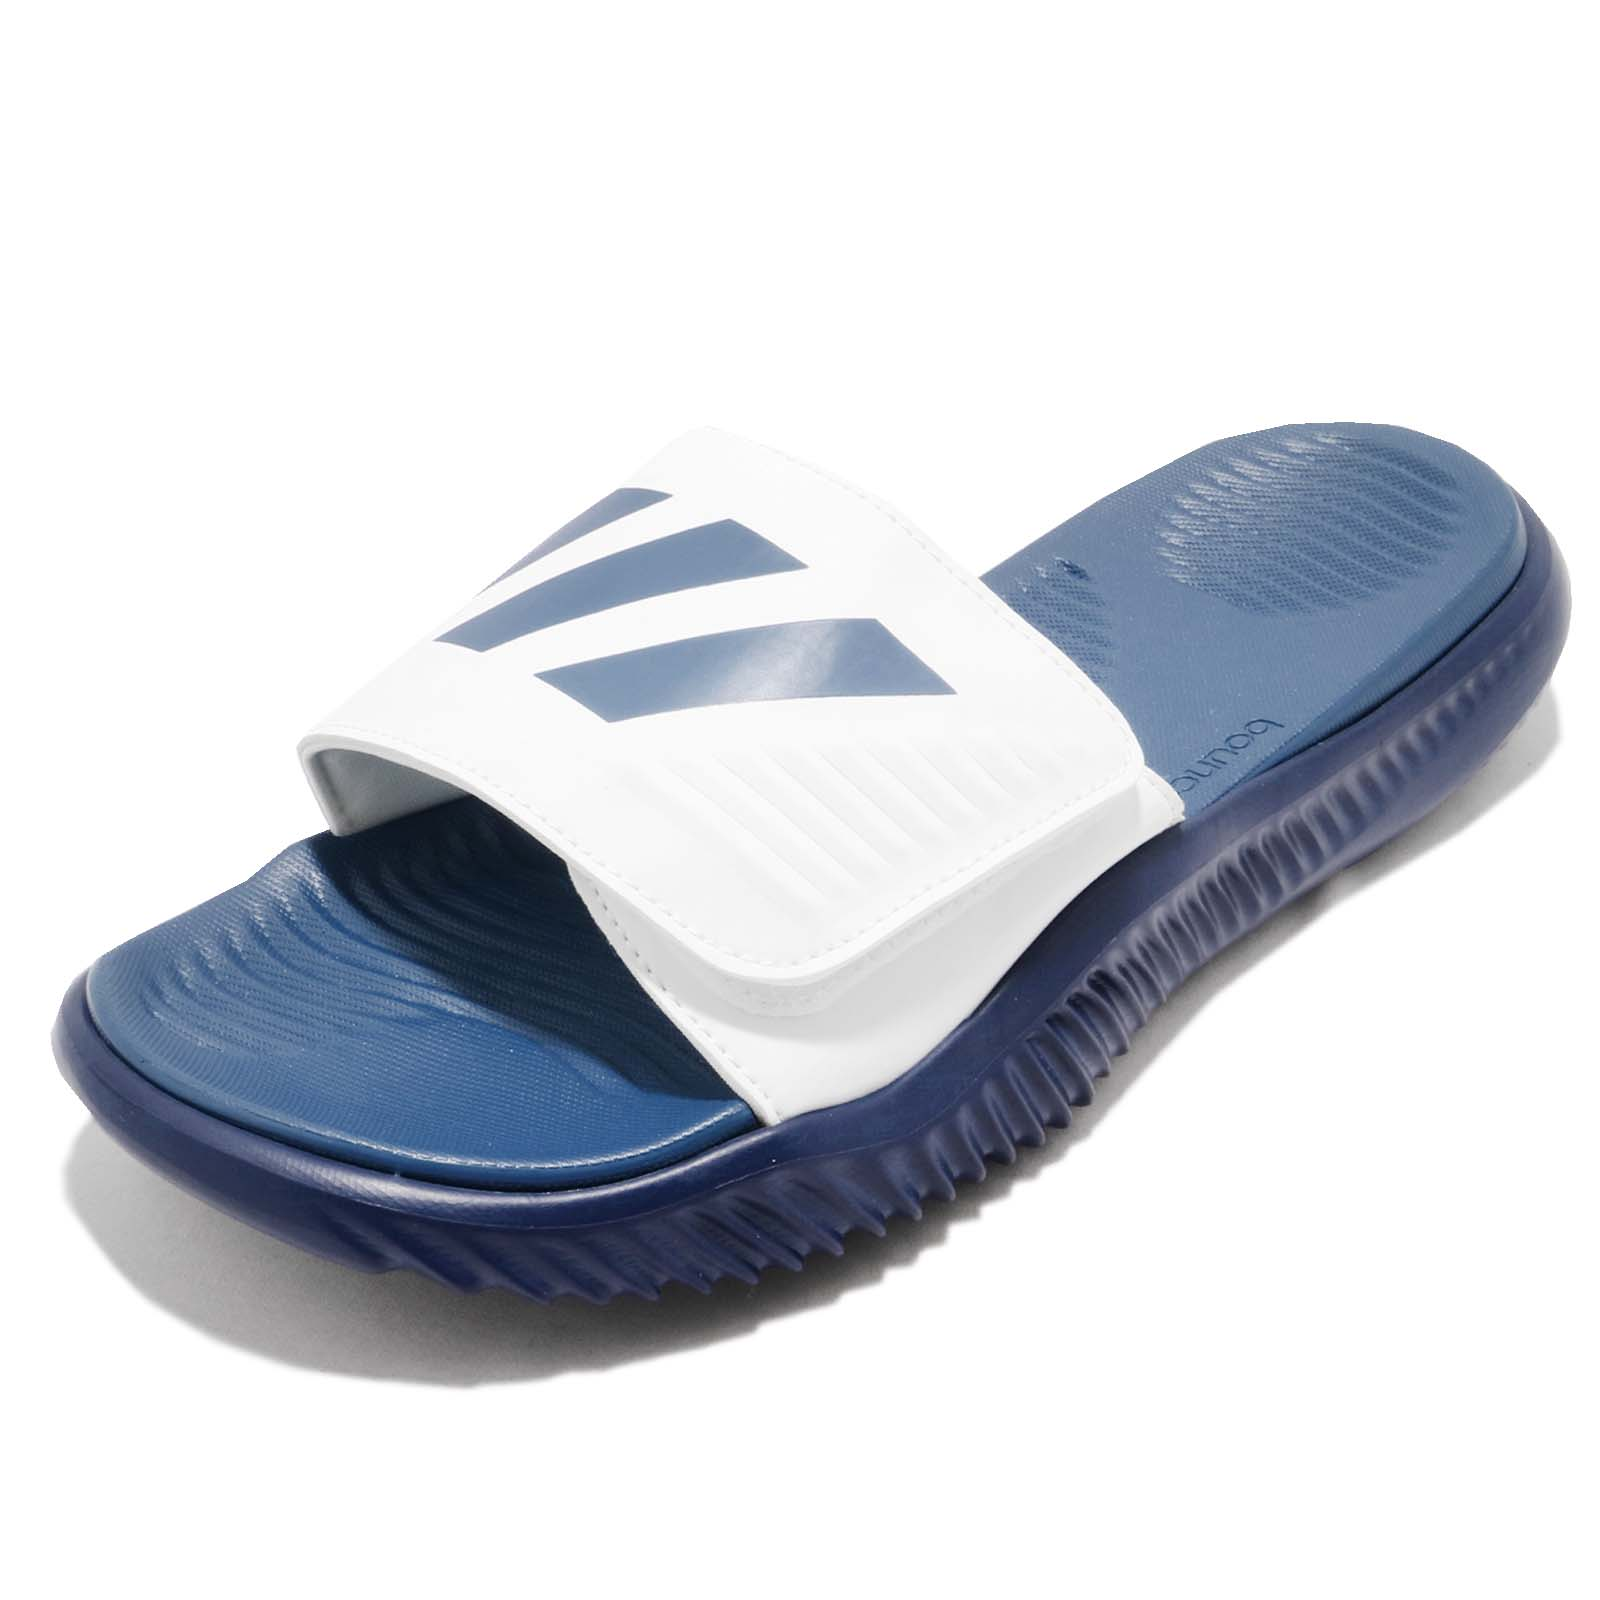 d7e1a0e7af58 adidas Alphabounce Slide 3 Stripes Blue White Men Sandal Slipper BA8777